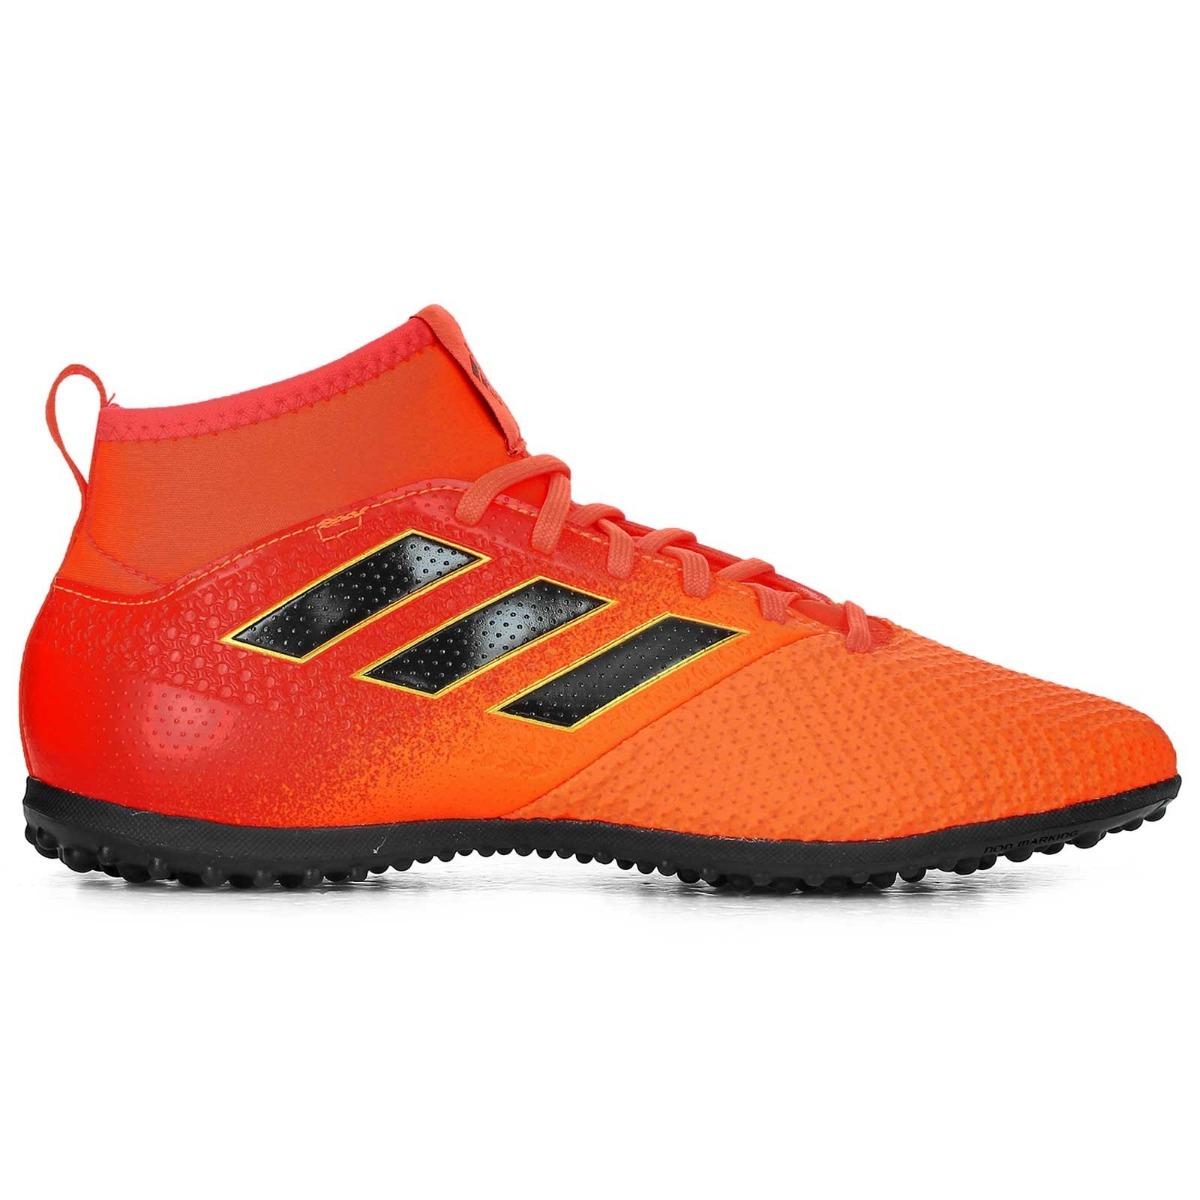 1b99cc26fdc54 botines bota adidas papi futbol niños ace tango 17.3 tf j. Cargando zoom.